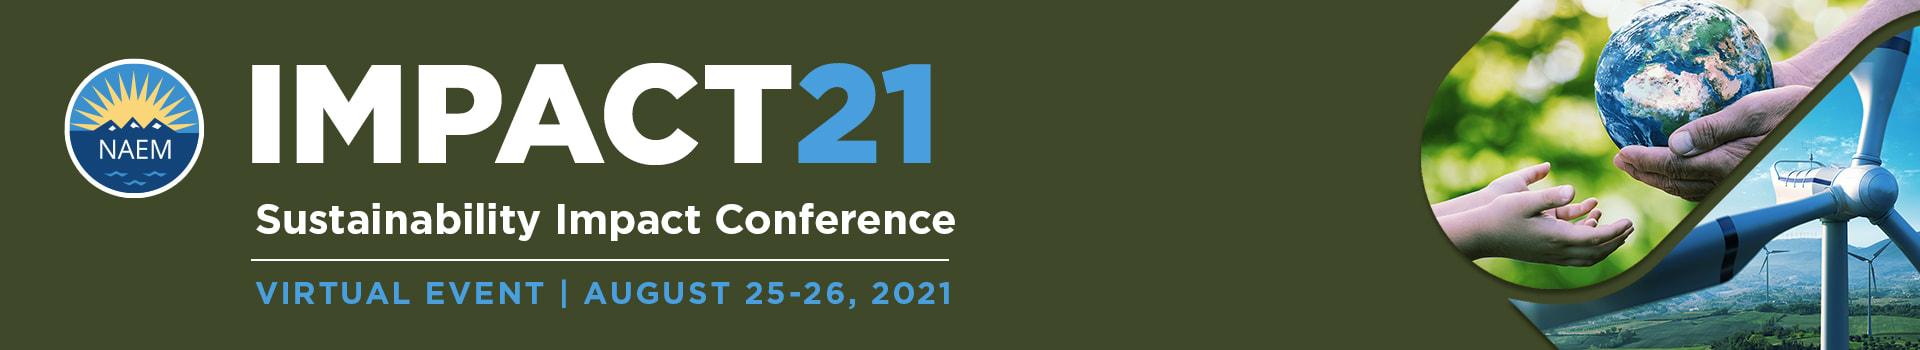 IMPACT21 | Sustainability Impact Conference